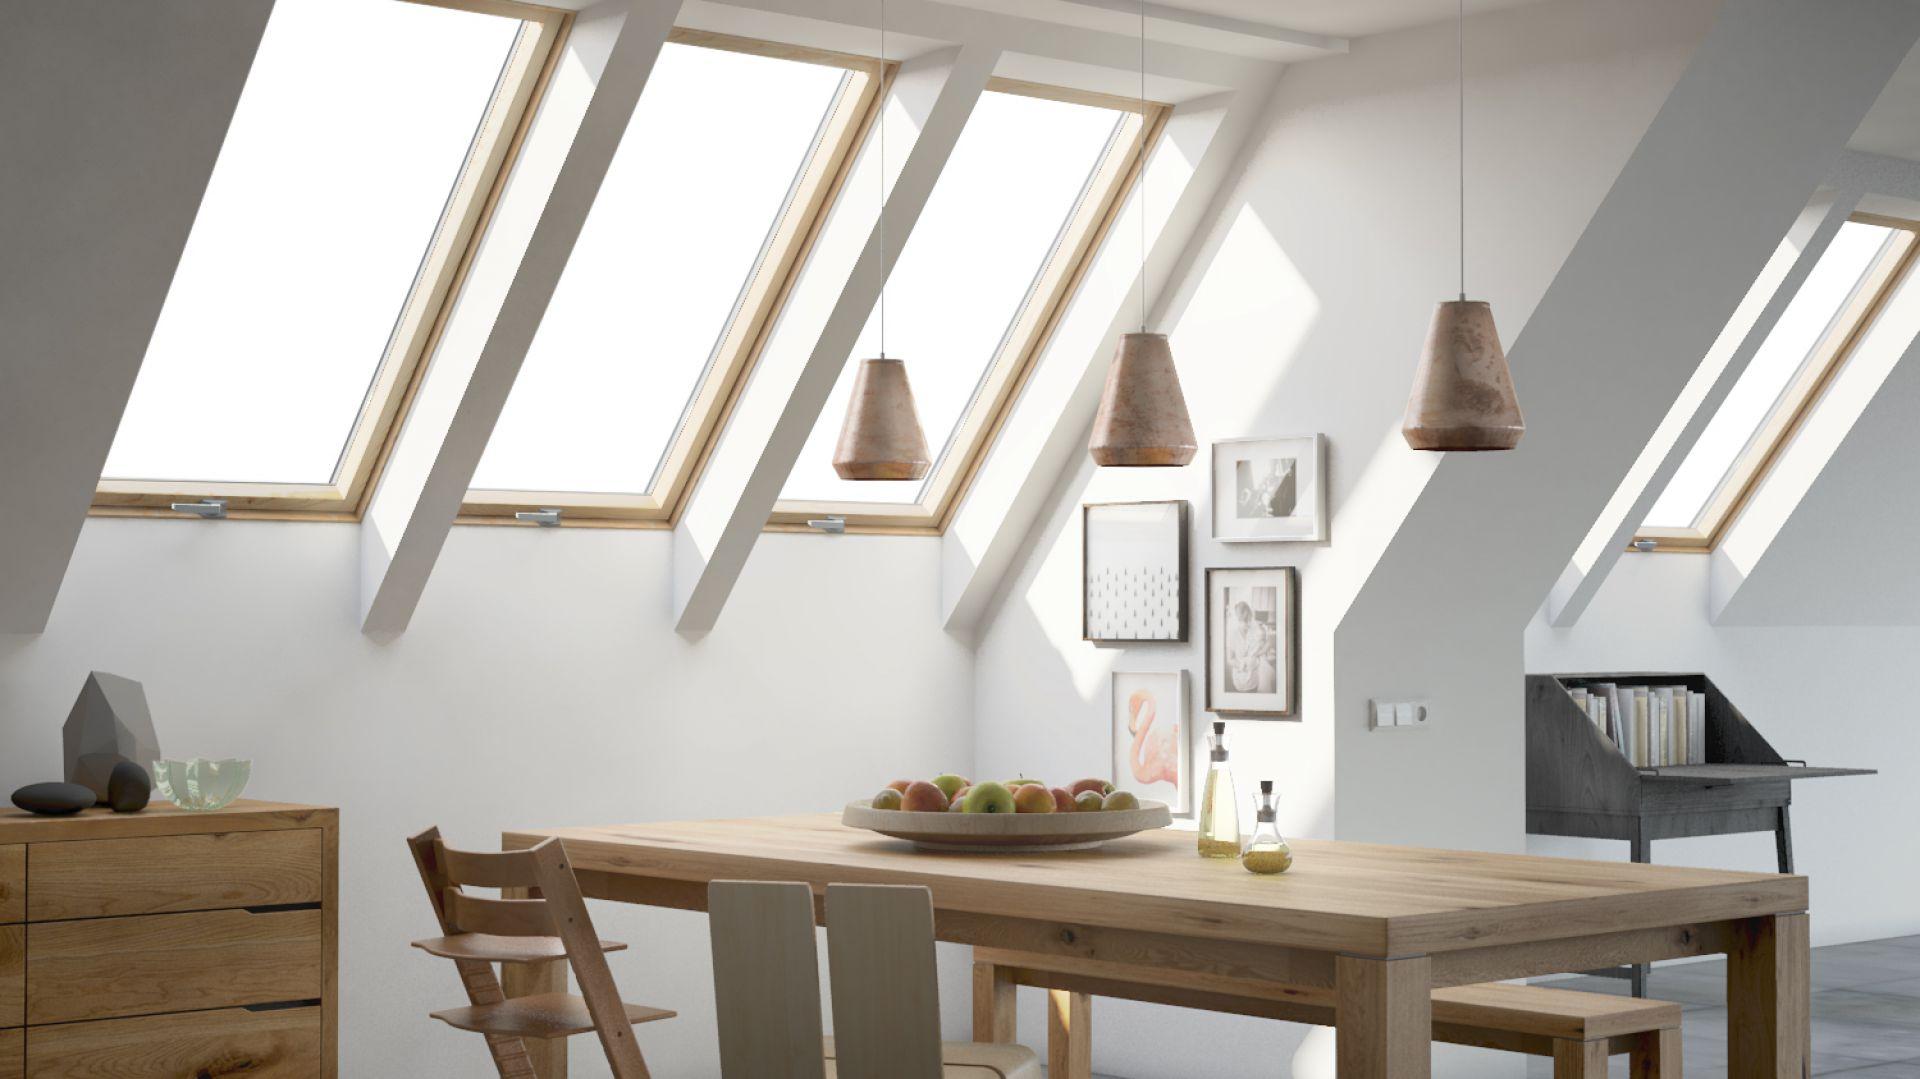 Okna dachowe EnergyLite. Fot. 4IQ